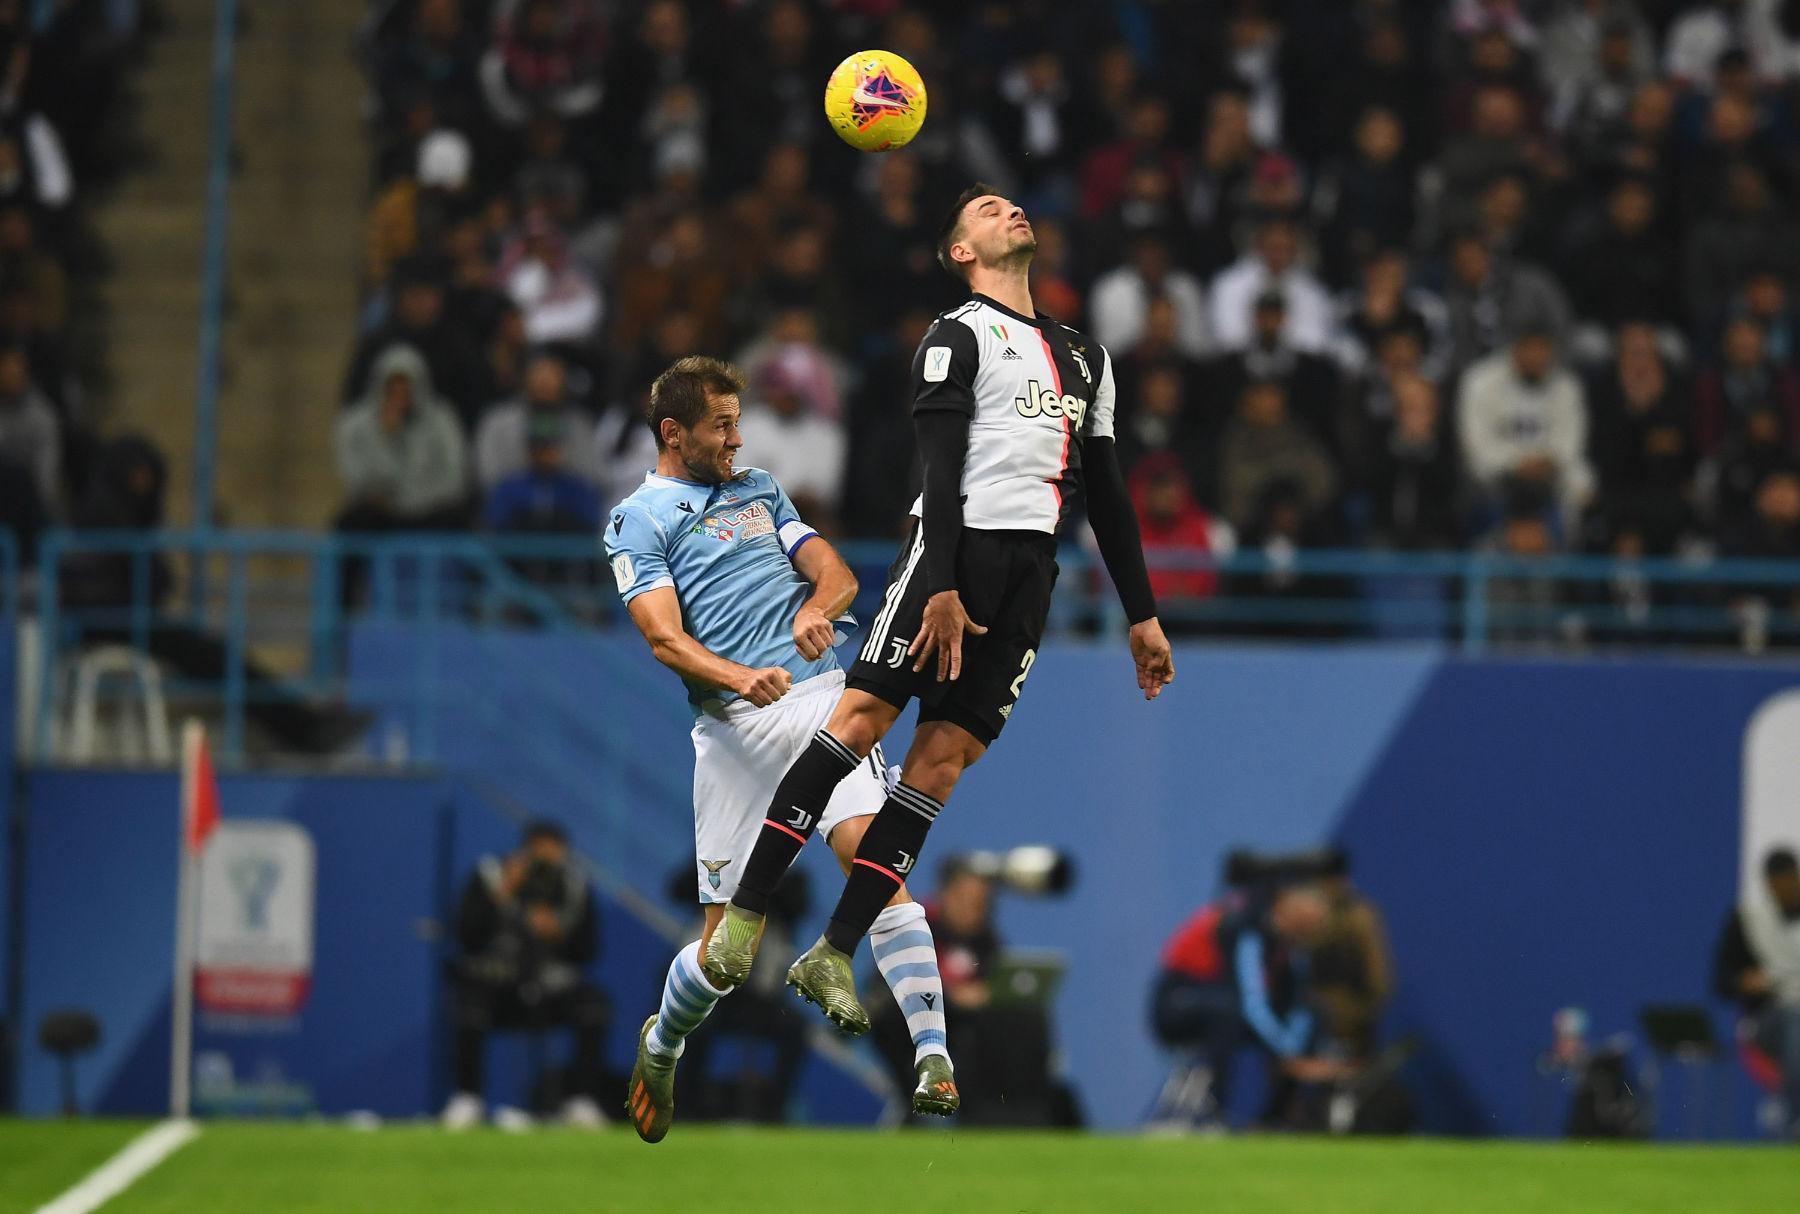 PSG Tracking Borussia Dortmund Star Jadon Sancho - PSG Talk